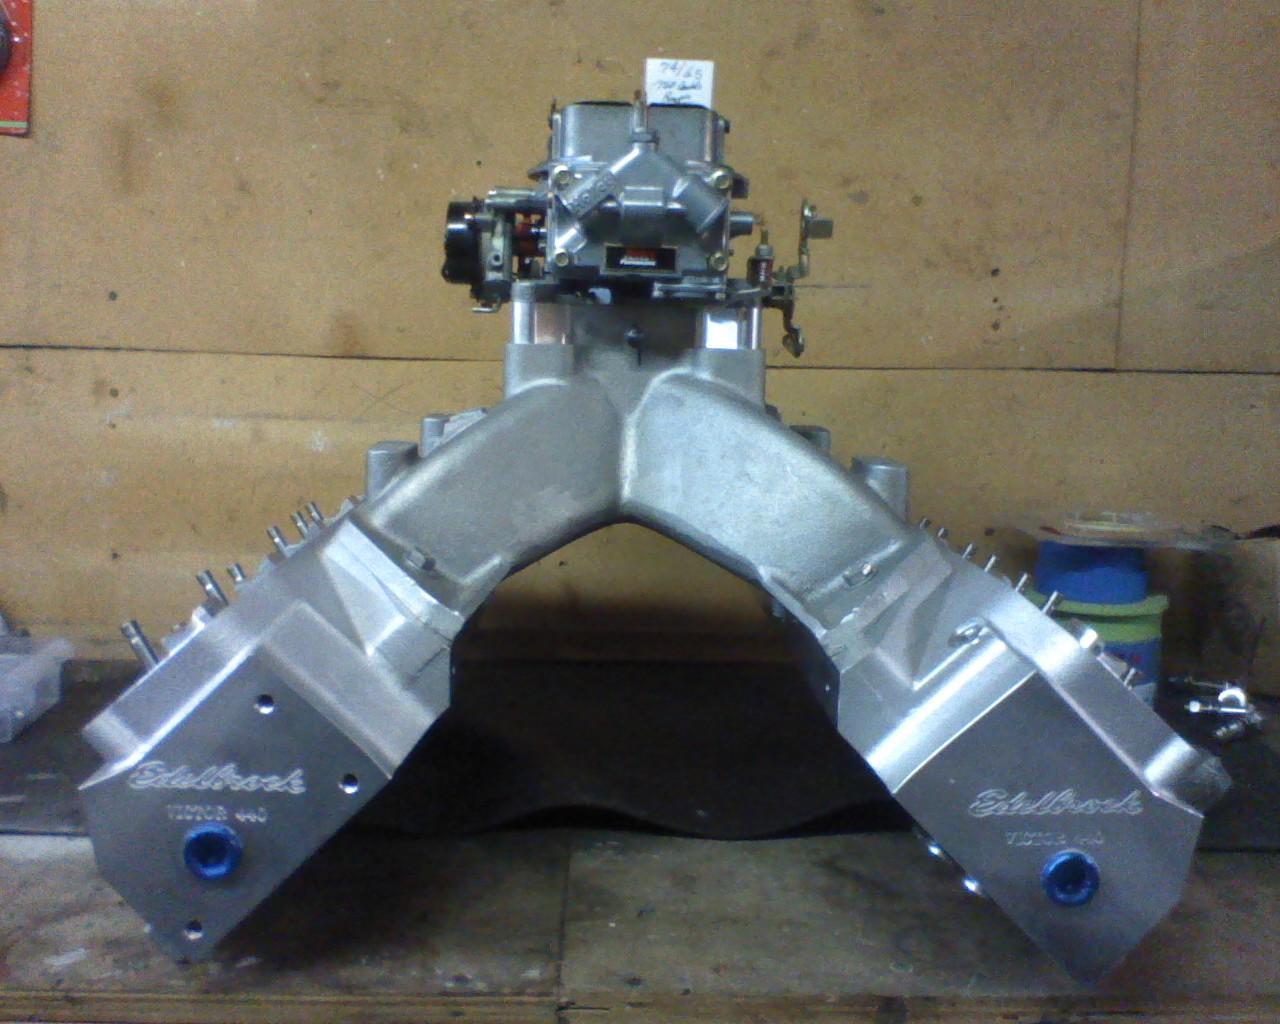 Low deck intake options for edelbrock victor heads